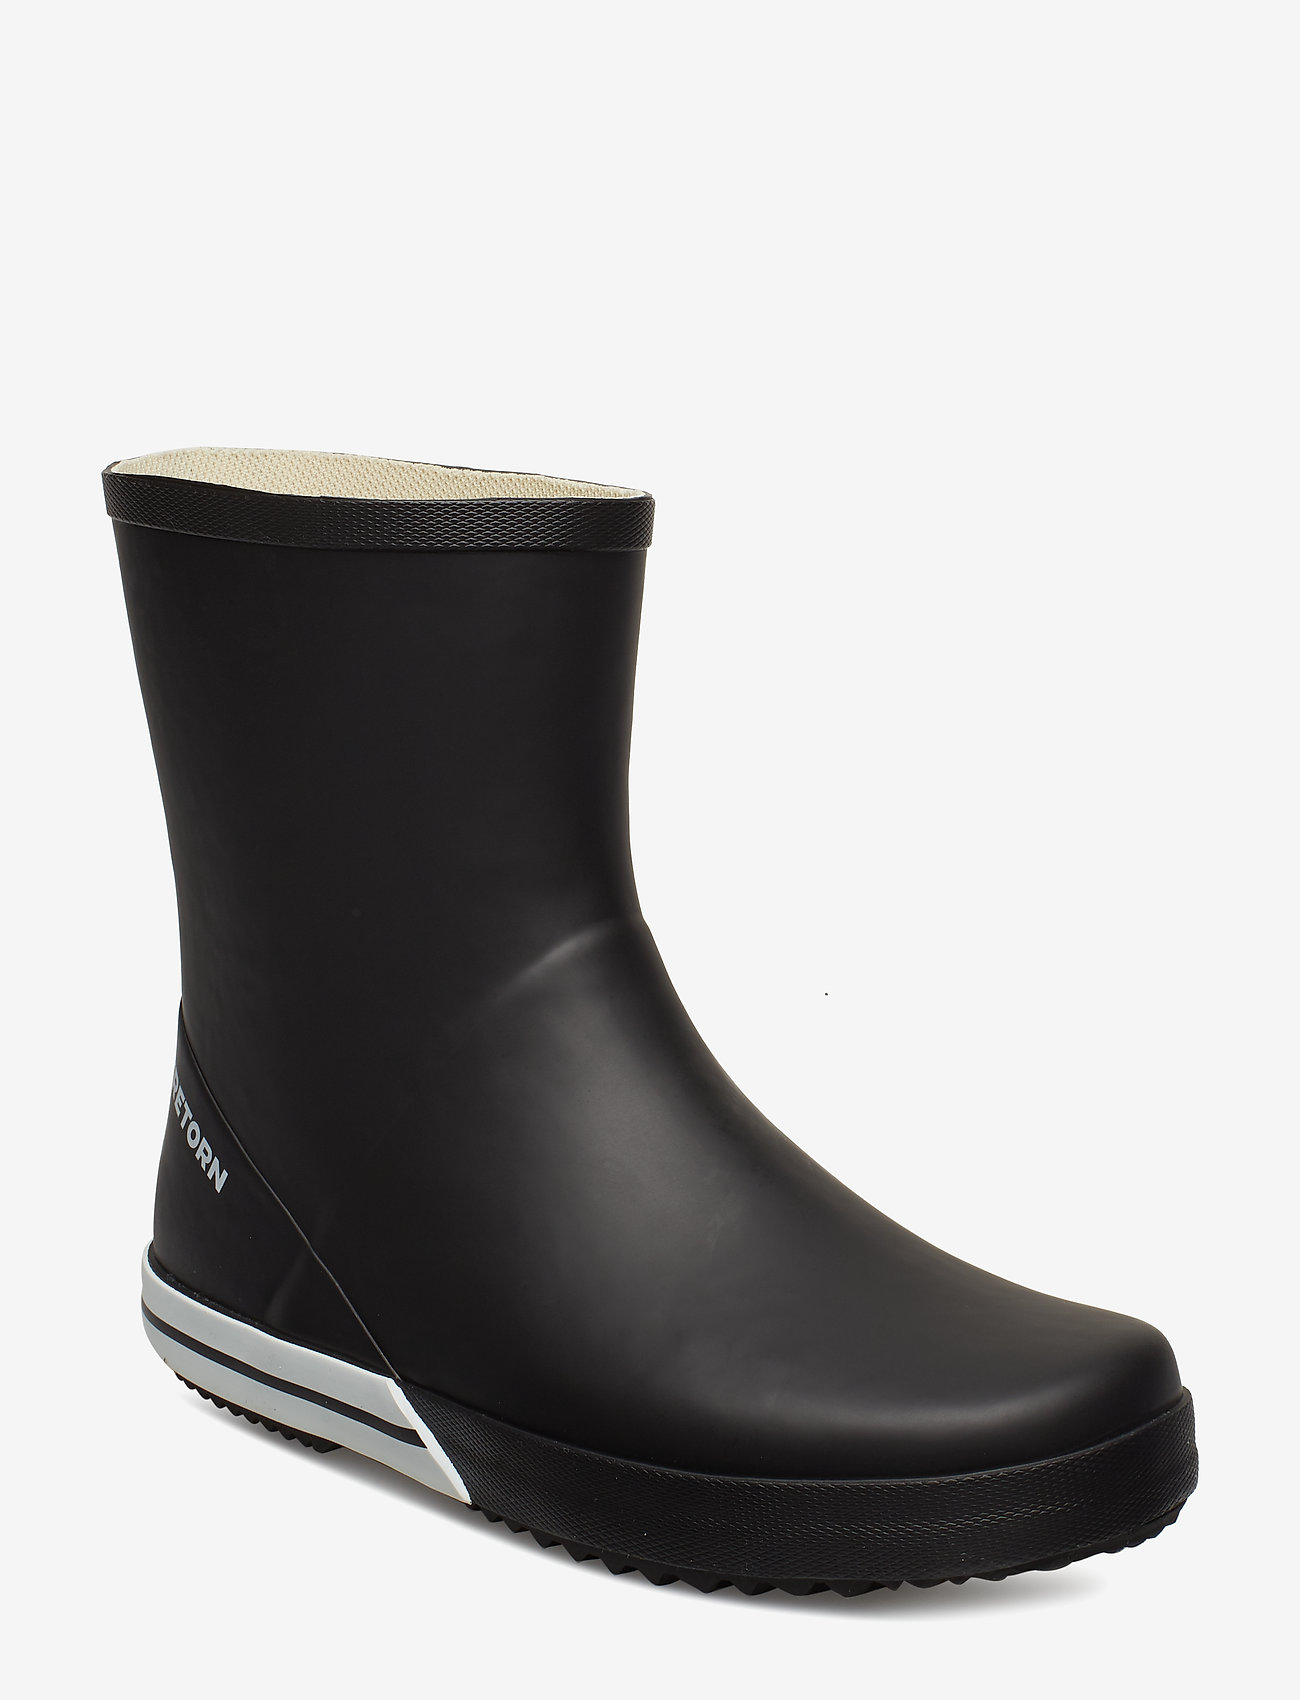 Tretorn - BASIC MID - rain boots - 010/black - 0